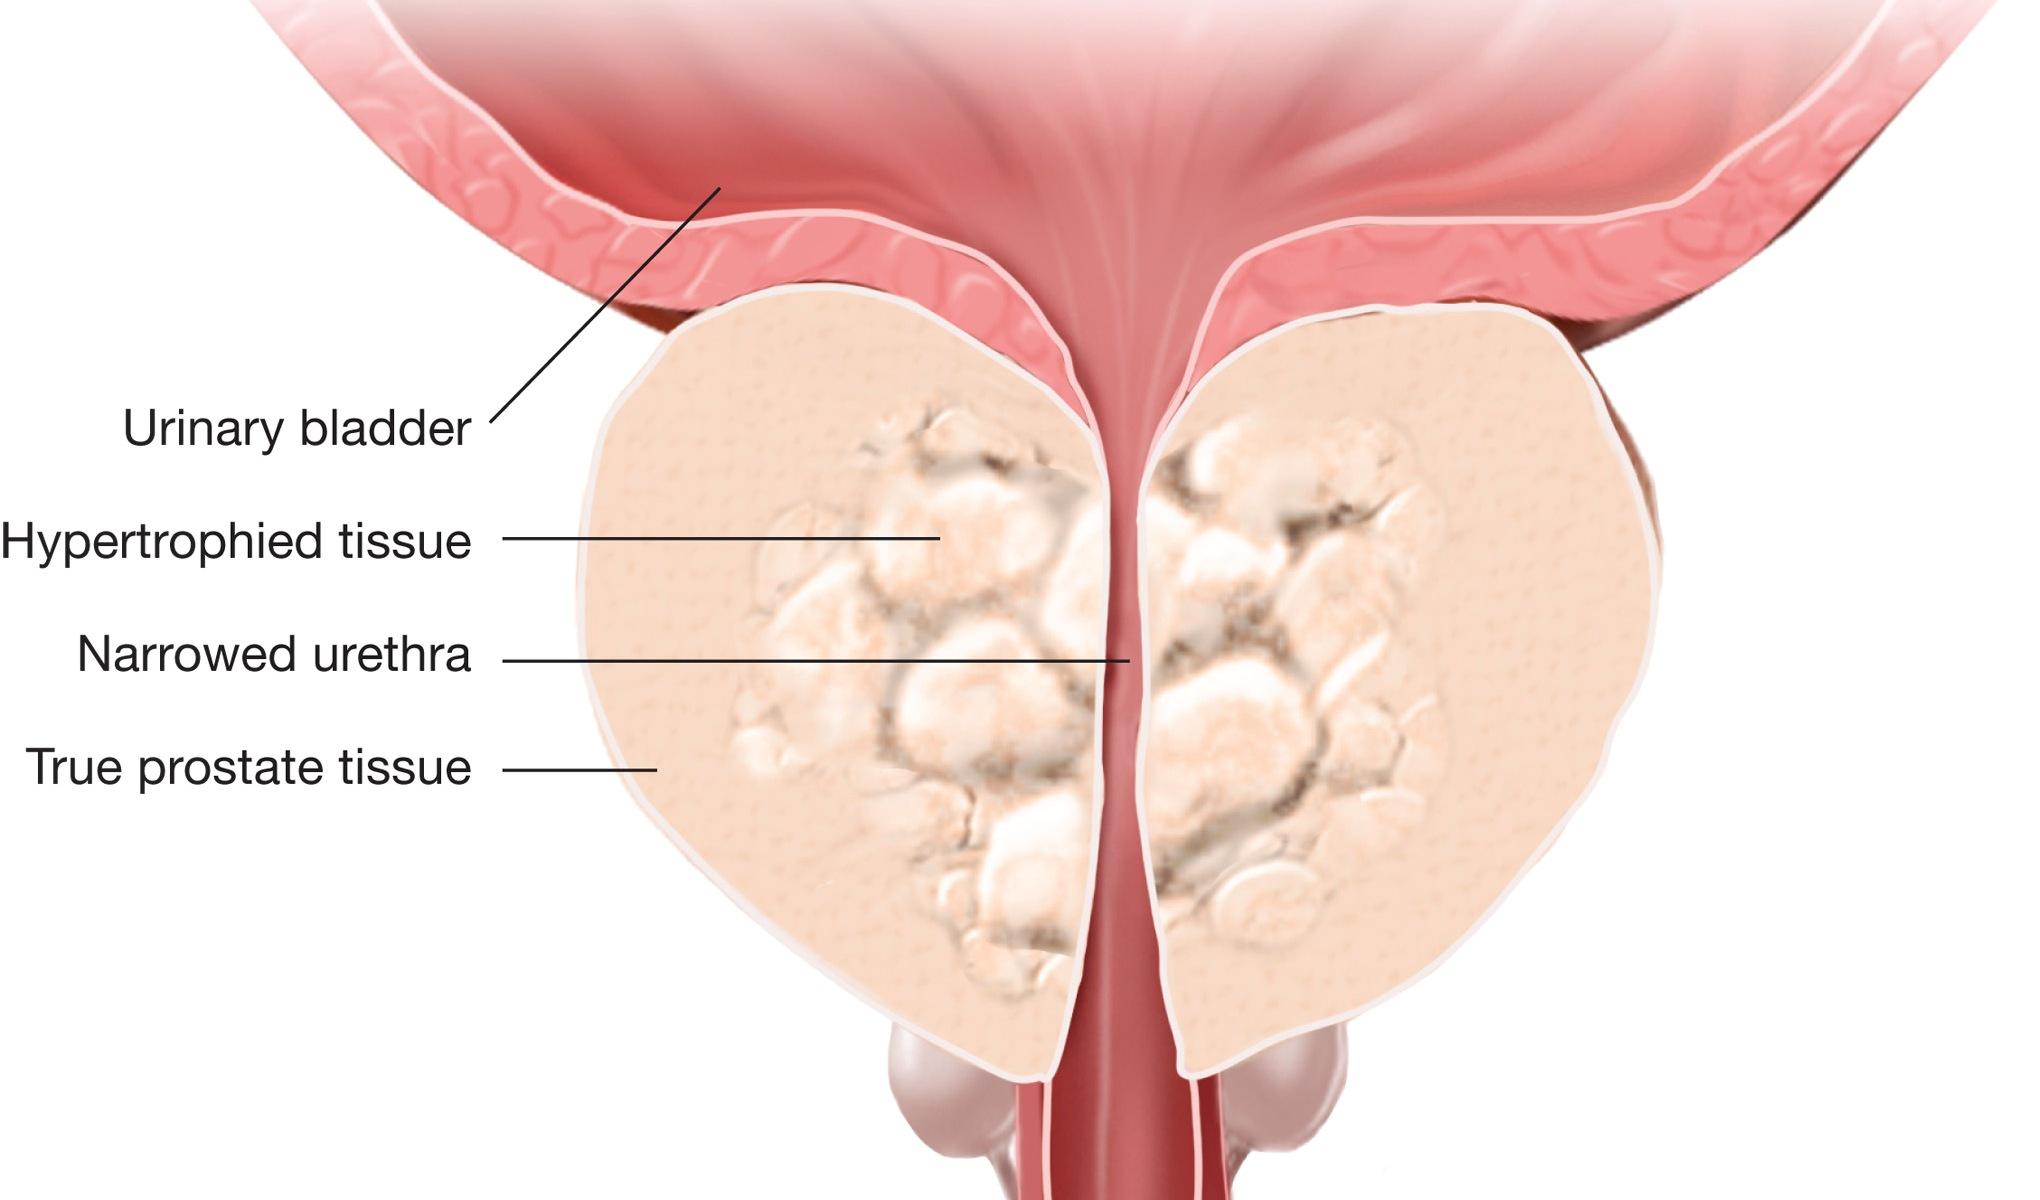 pembesaran prostat jinak